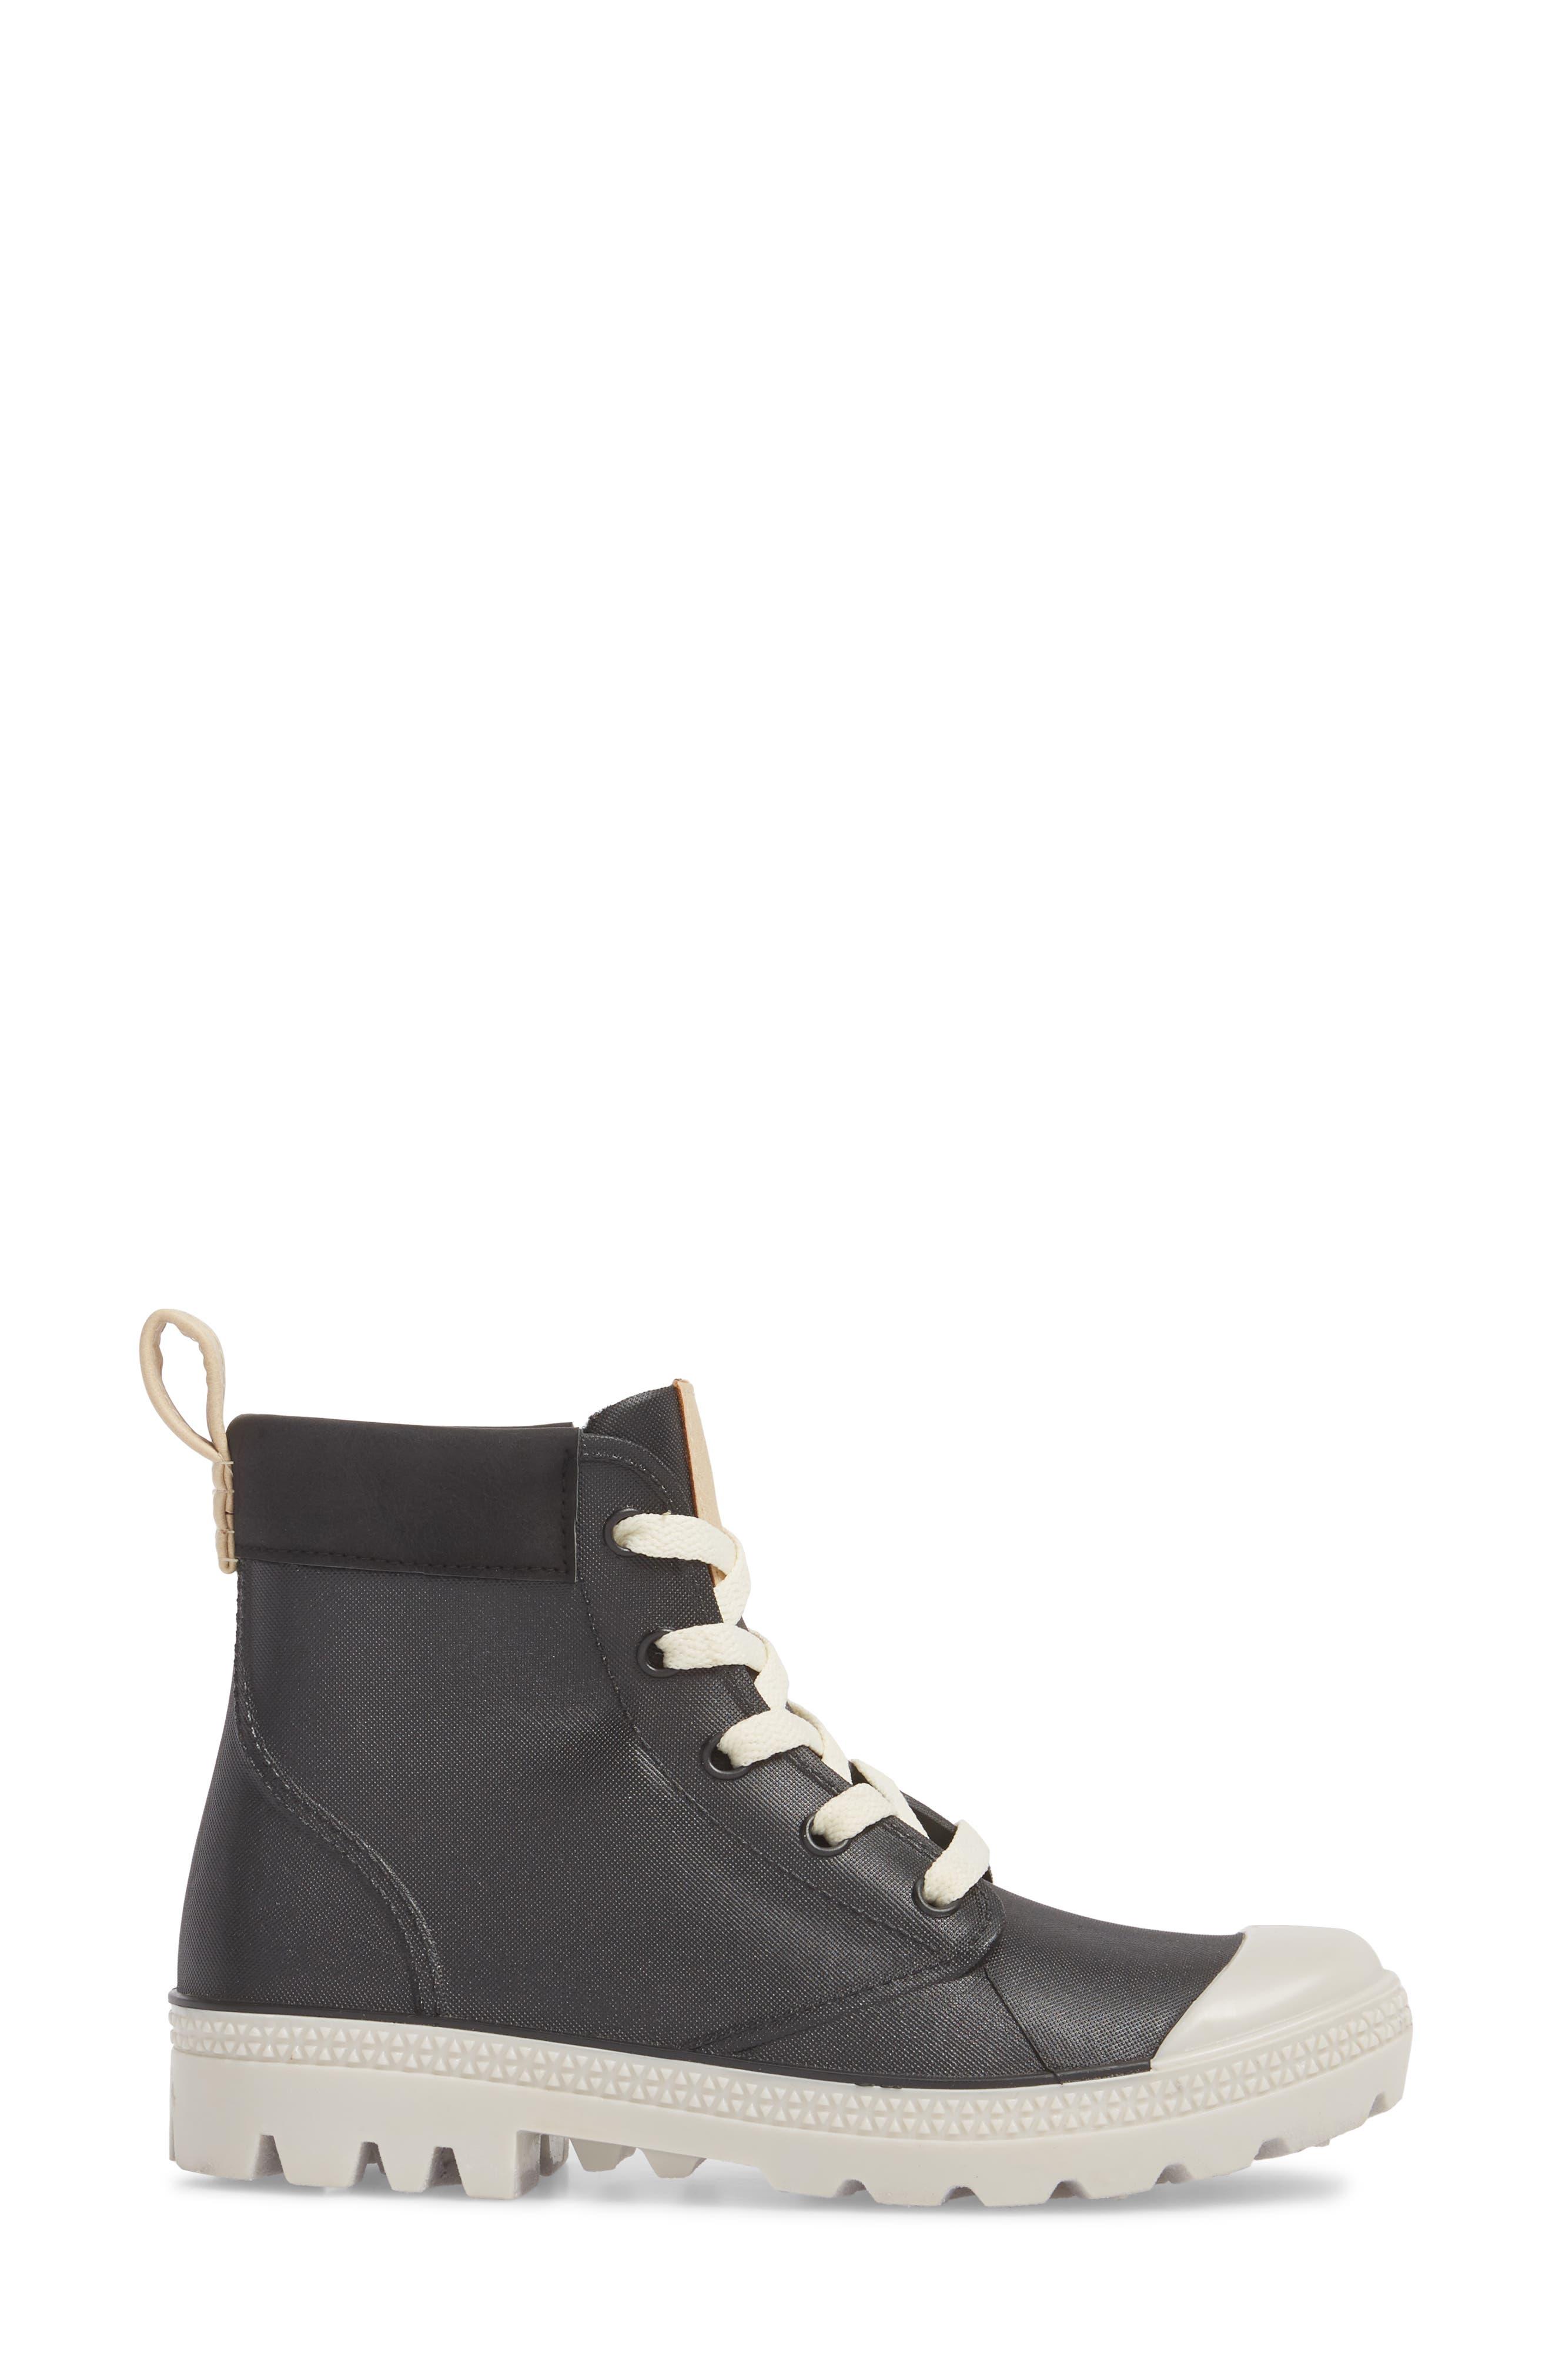 DÄV, Melrose Waterproof Sneaker Boot, Alternate thumbnail 3, color, 001